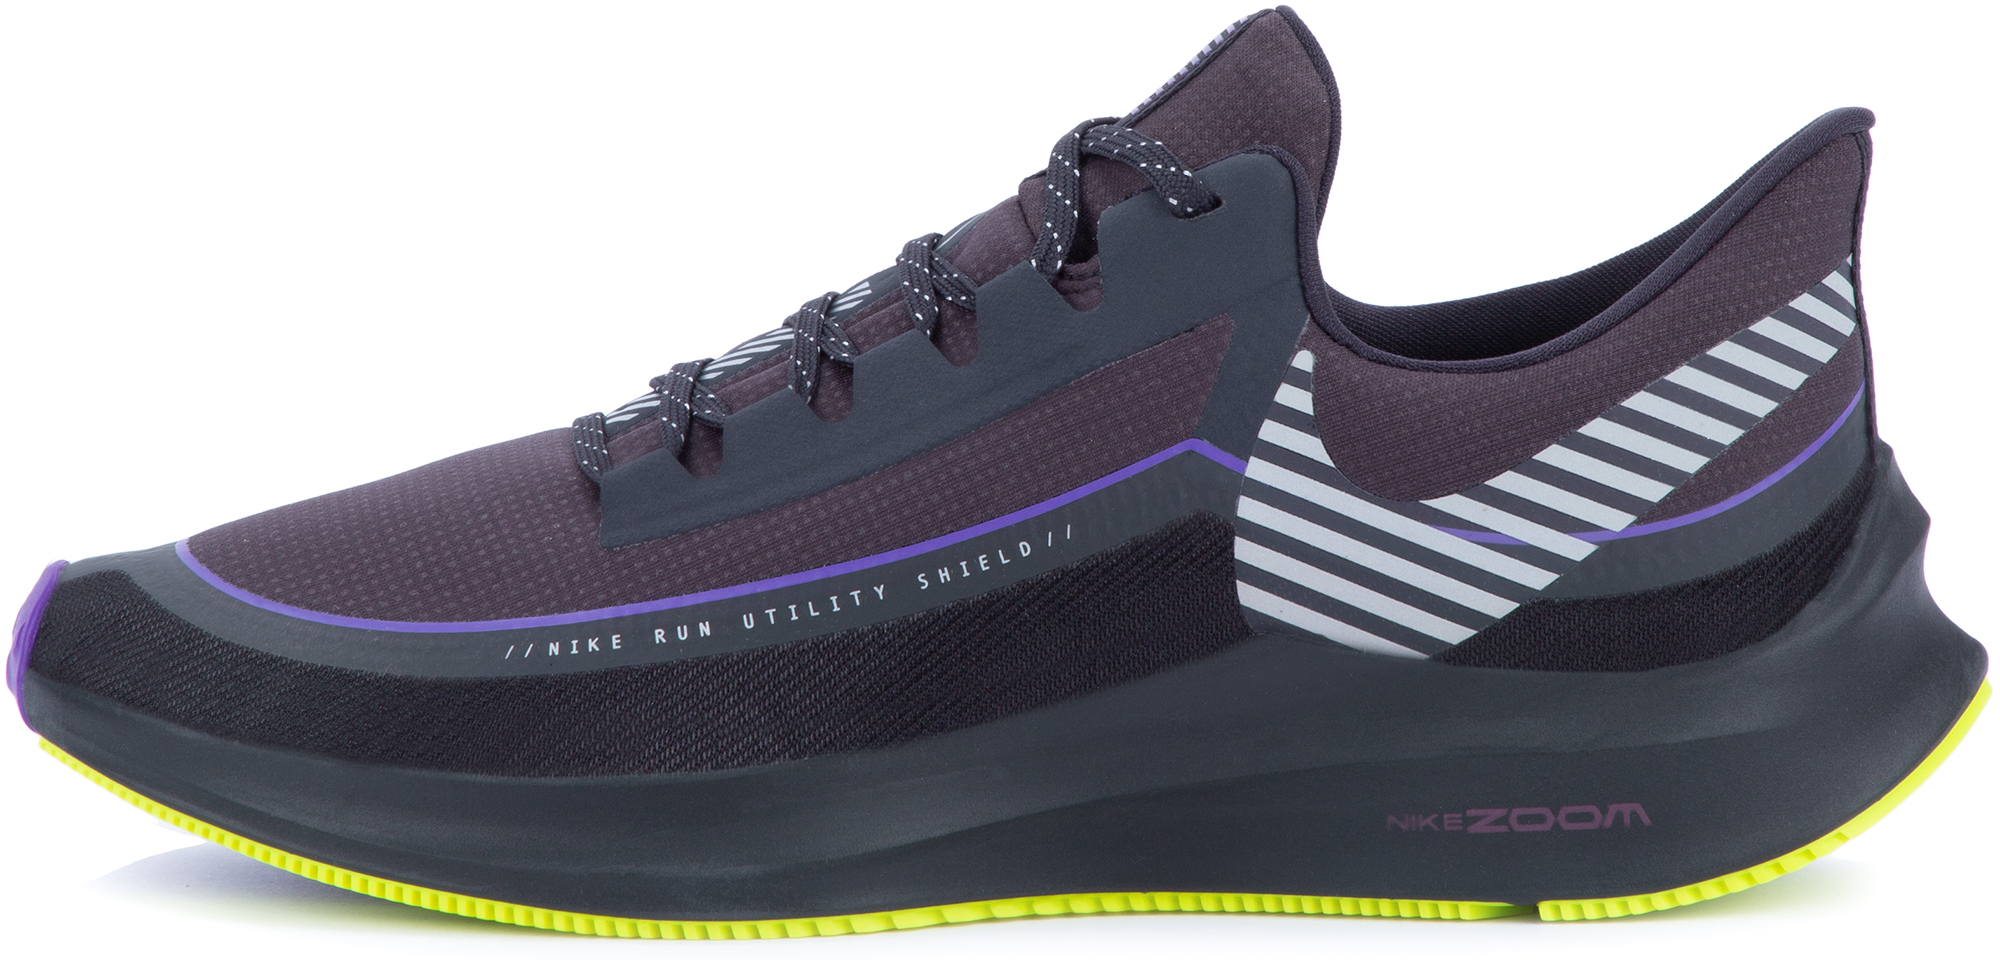 Nike Кроссовки мужские Zoom Winflo 6 Shield, размер 43,5